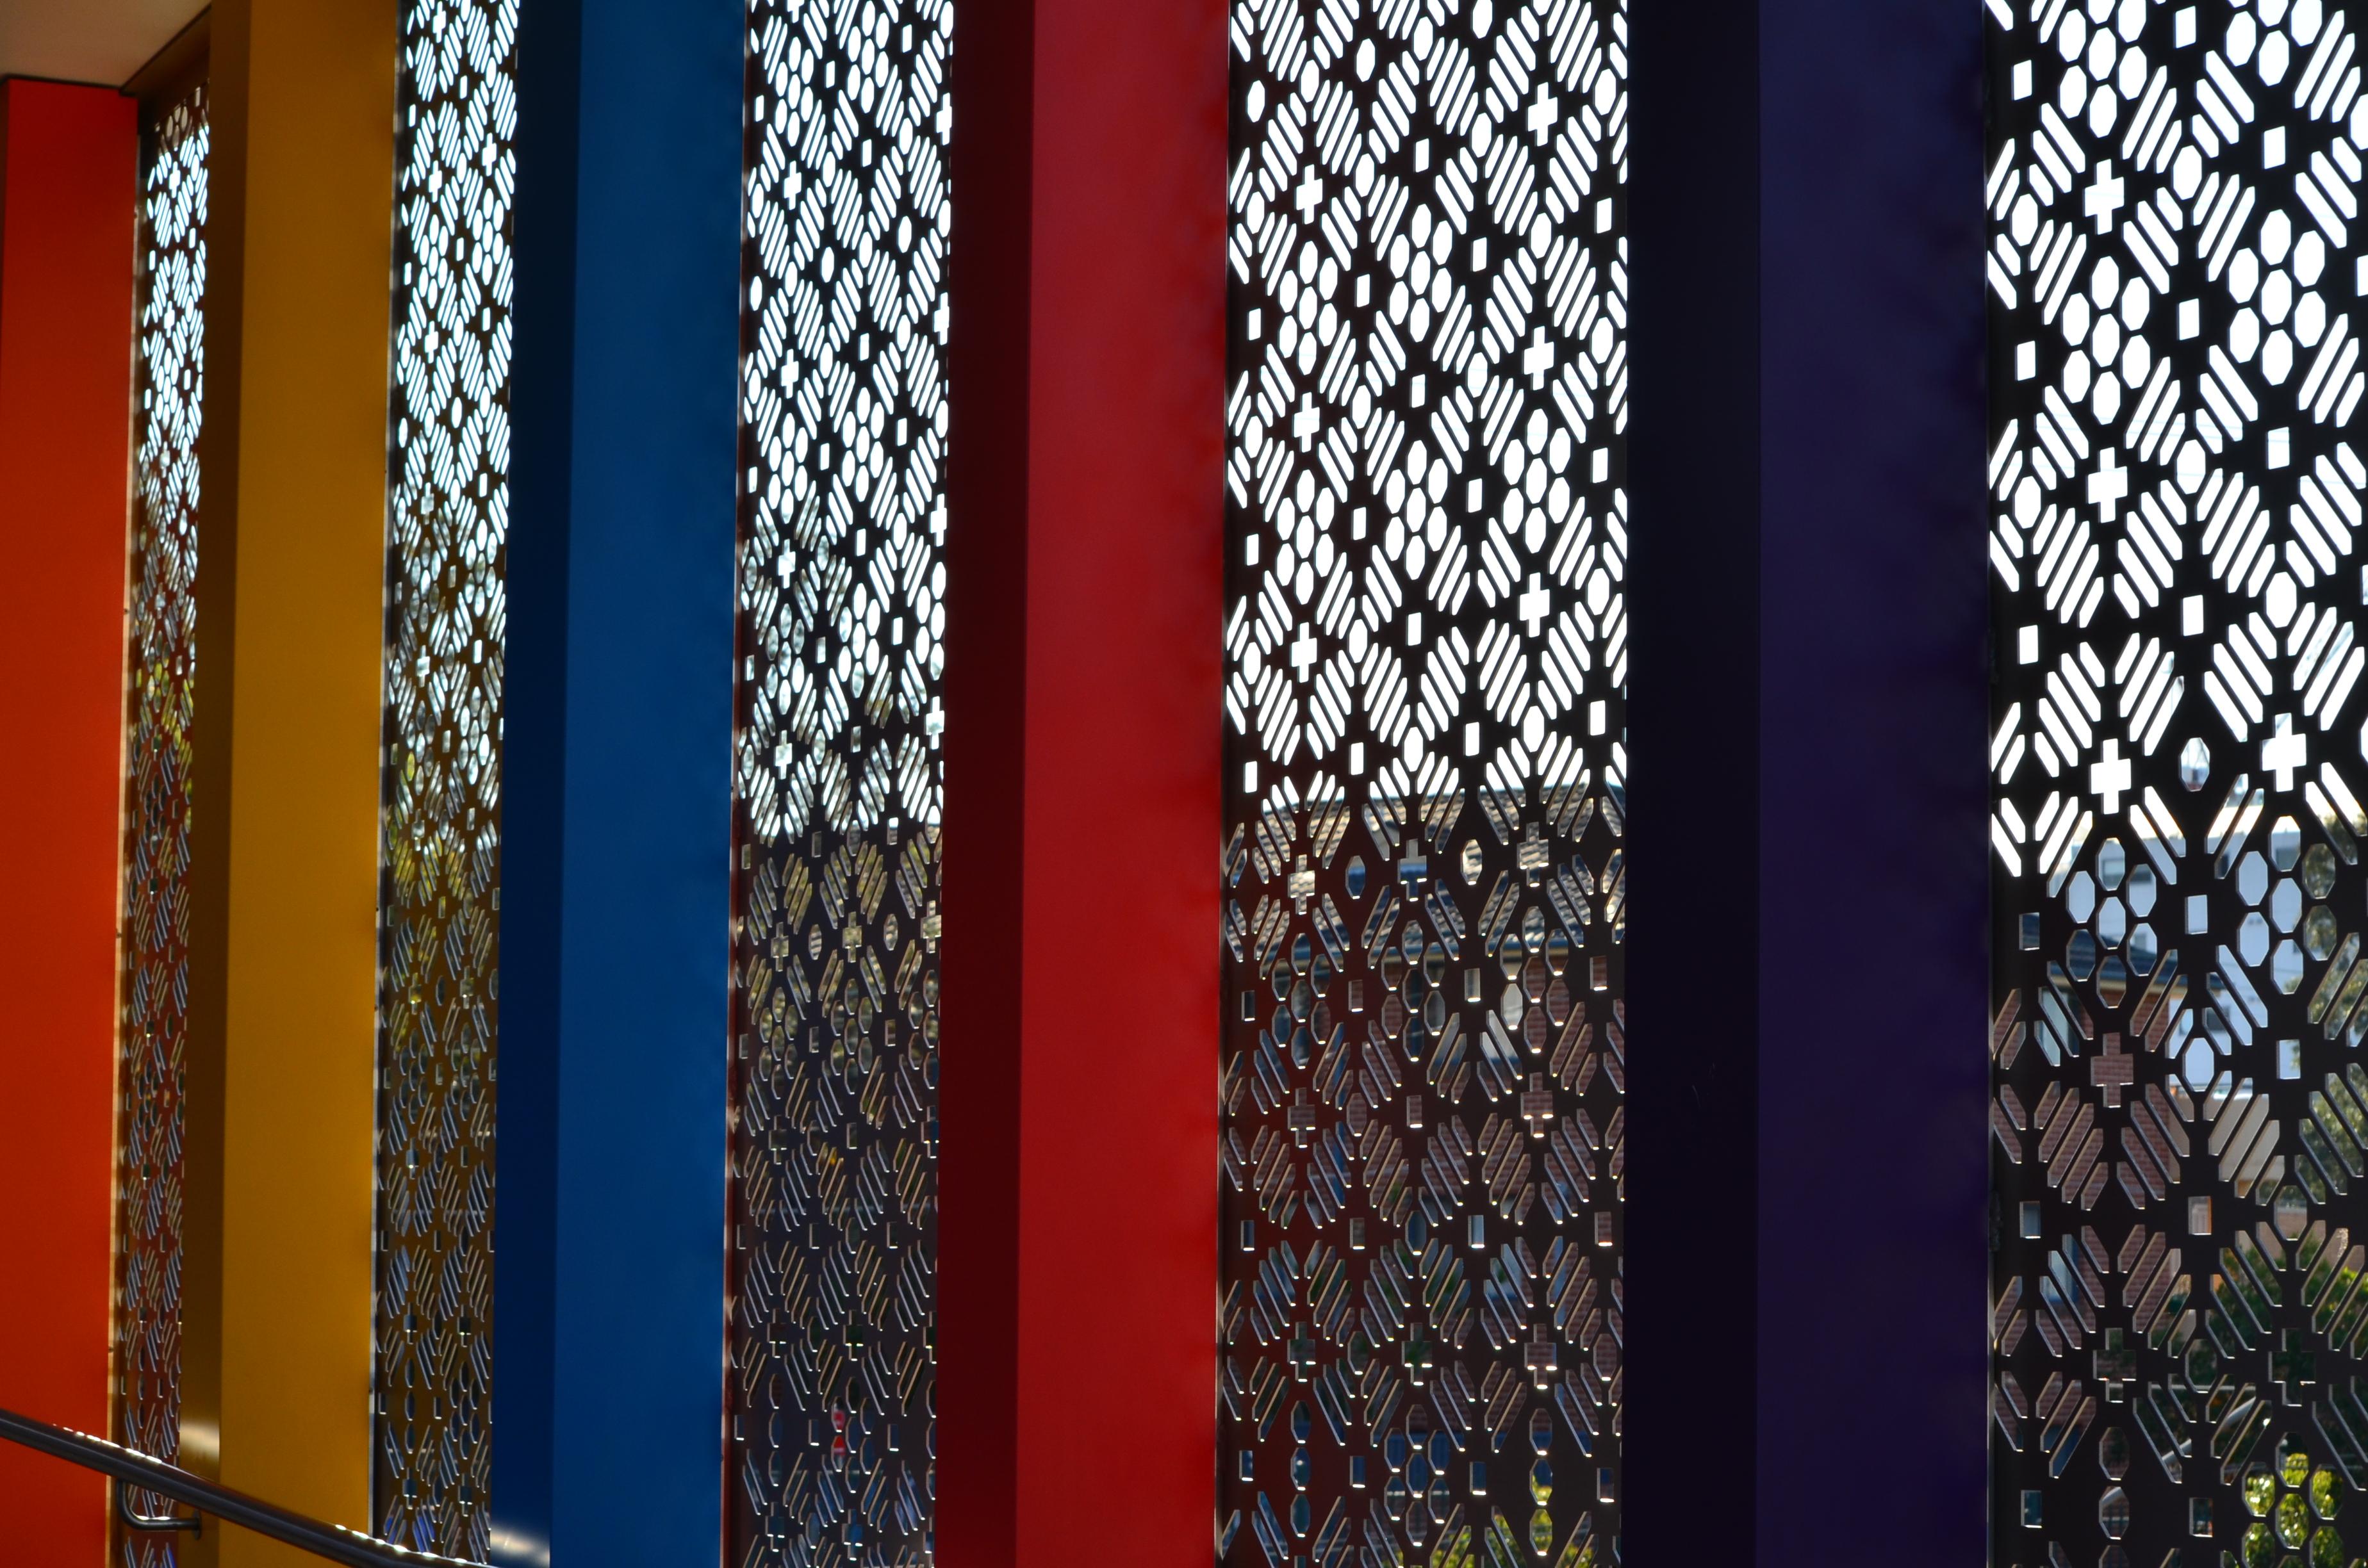 Bespoke perforated metal design -Harris Park Stationrk Station